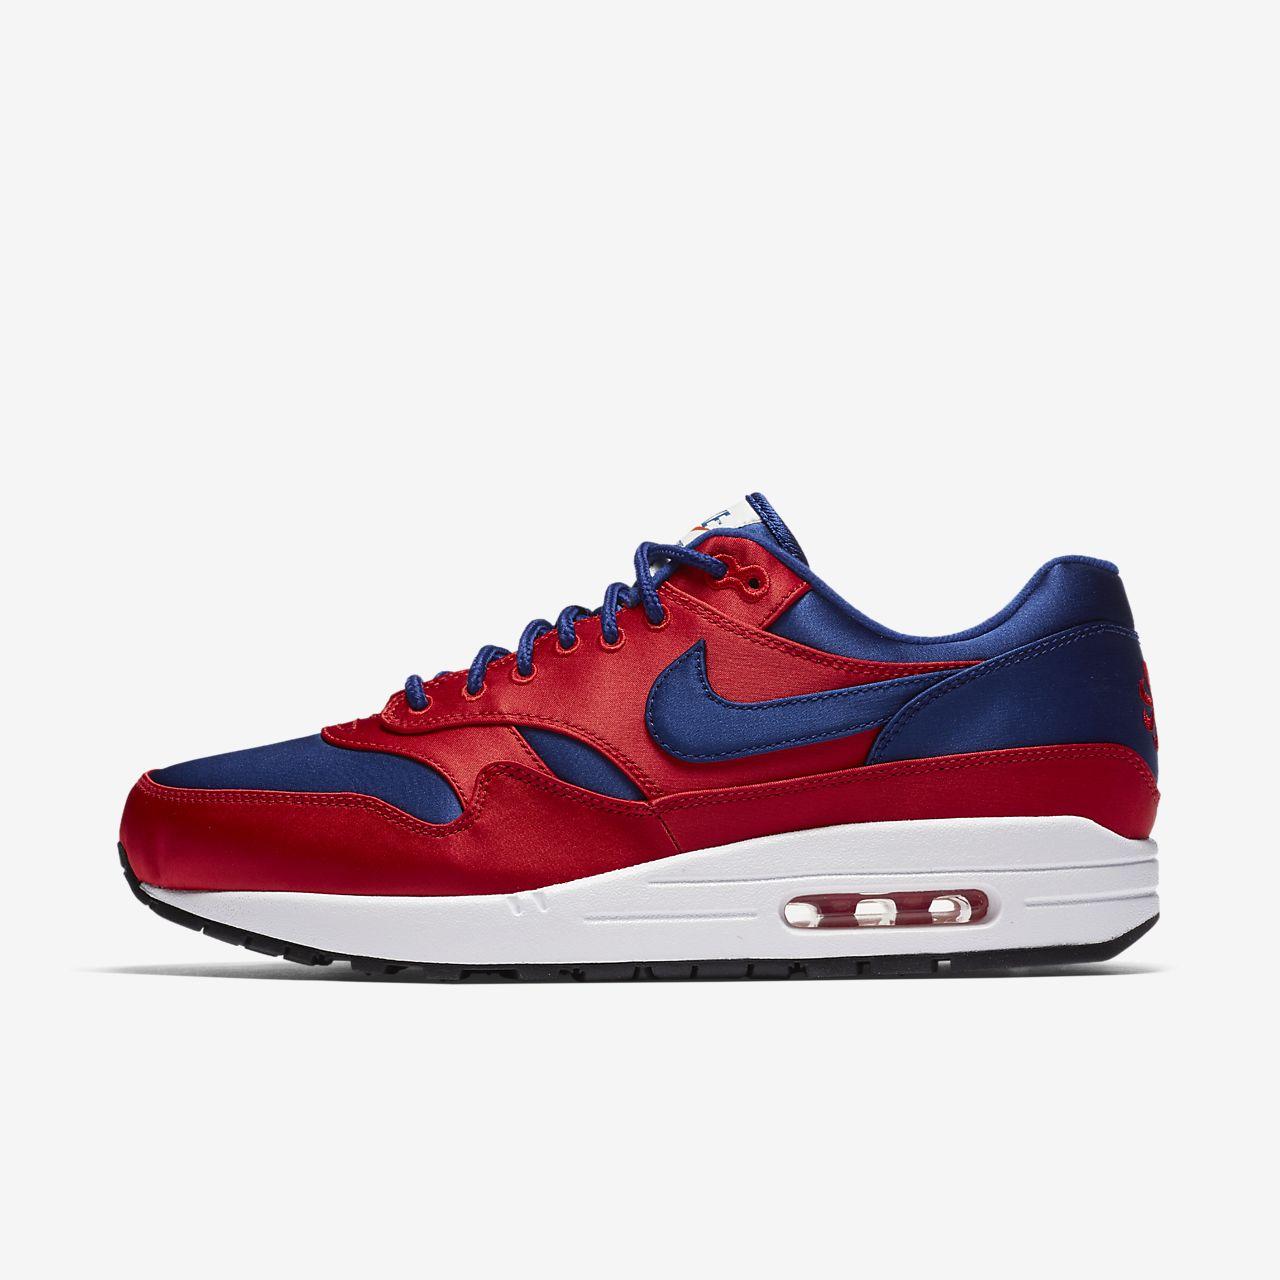 quality design 1fe4b 06a51 ... Buty męskie Nike Air Max 1 SE